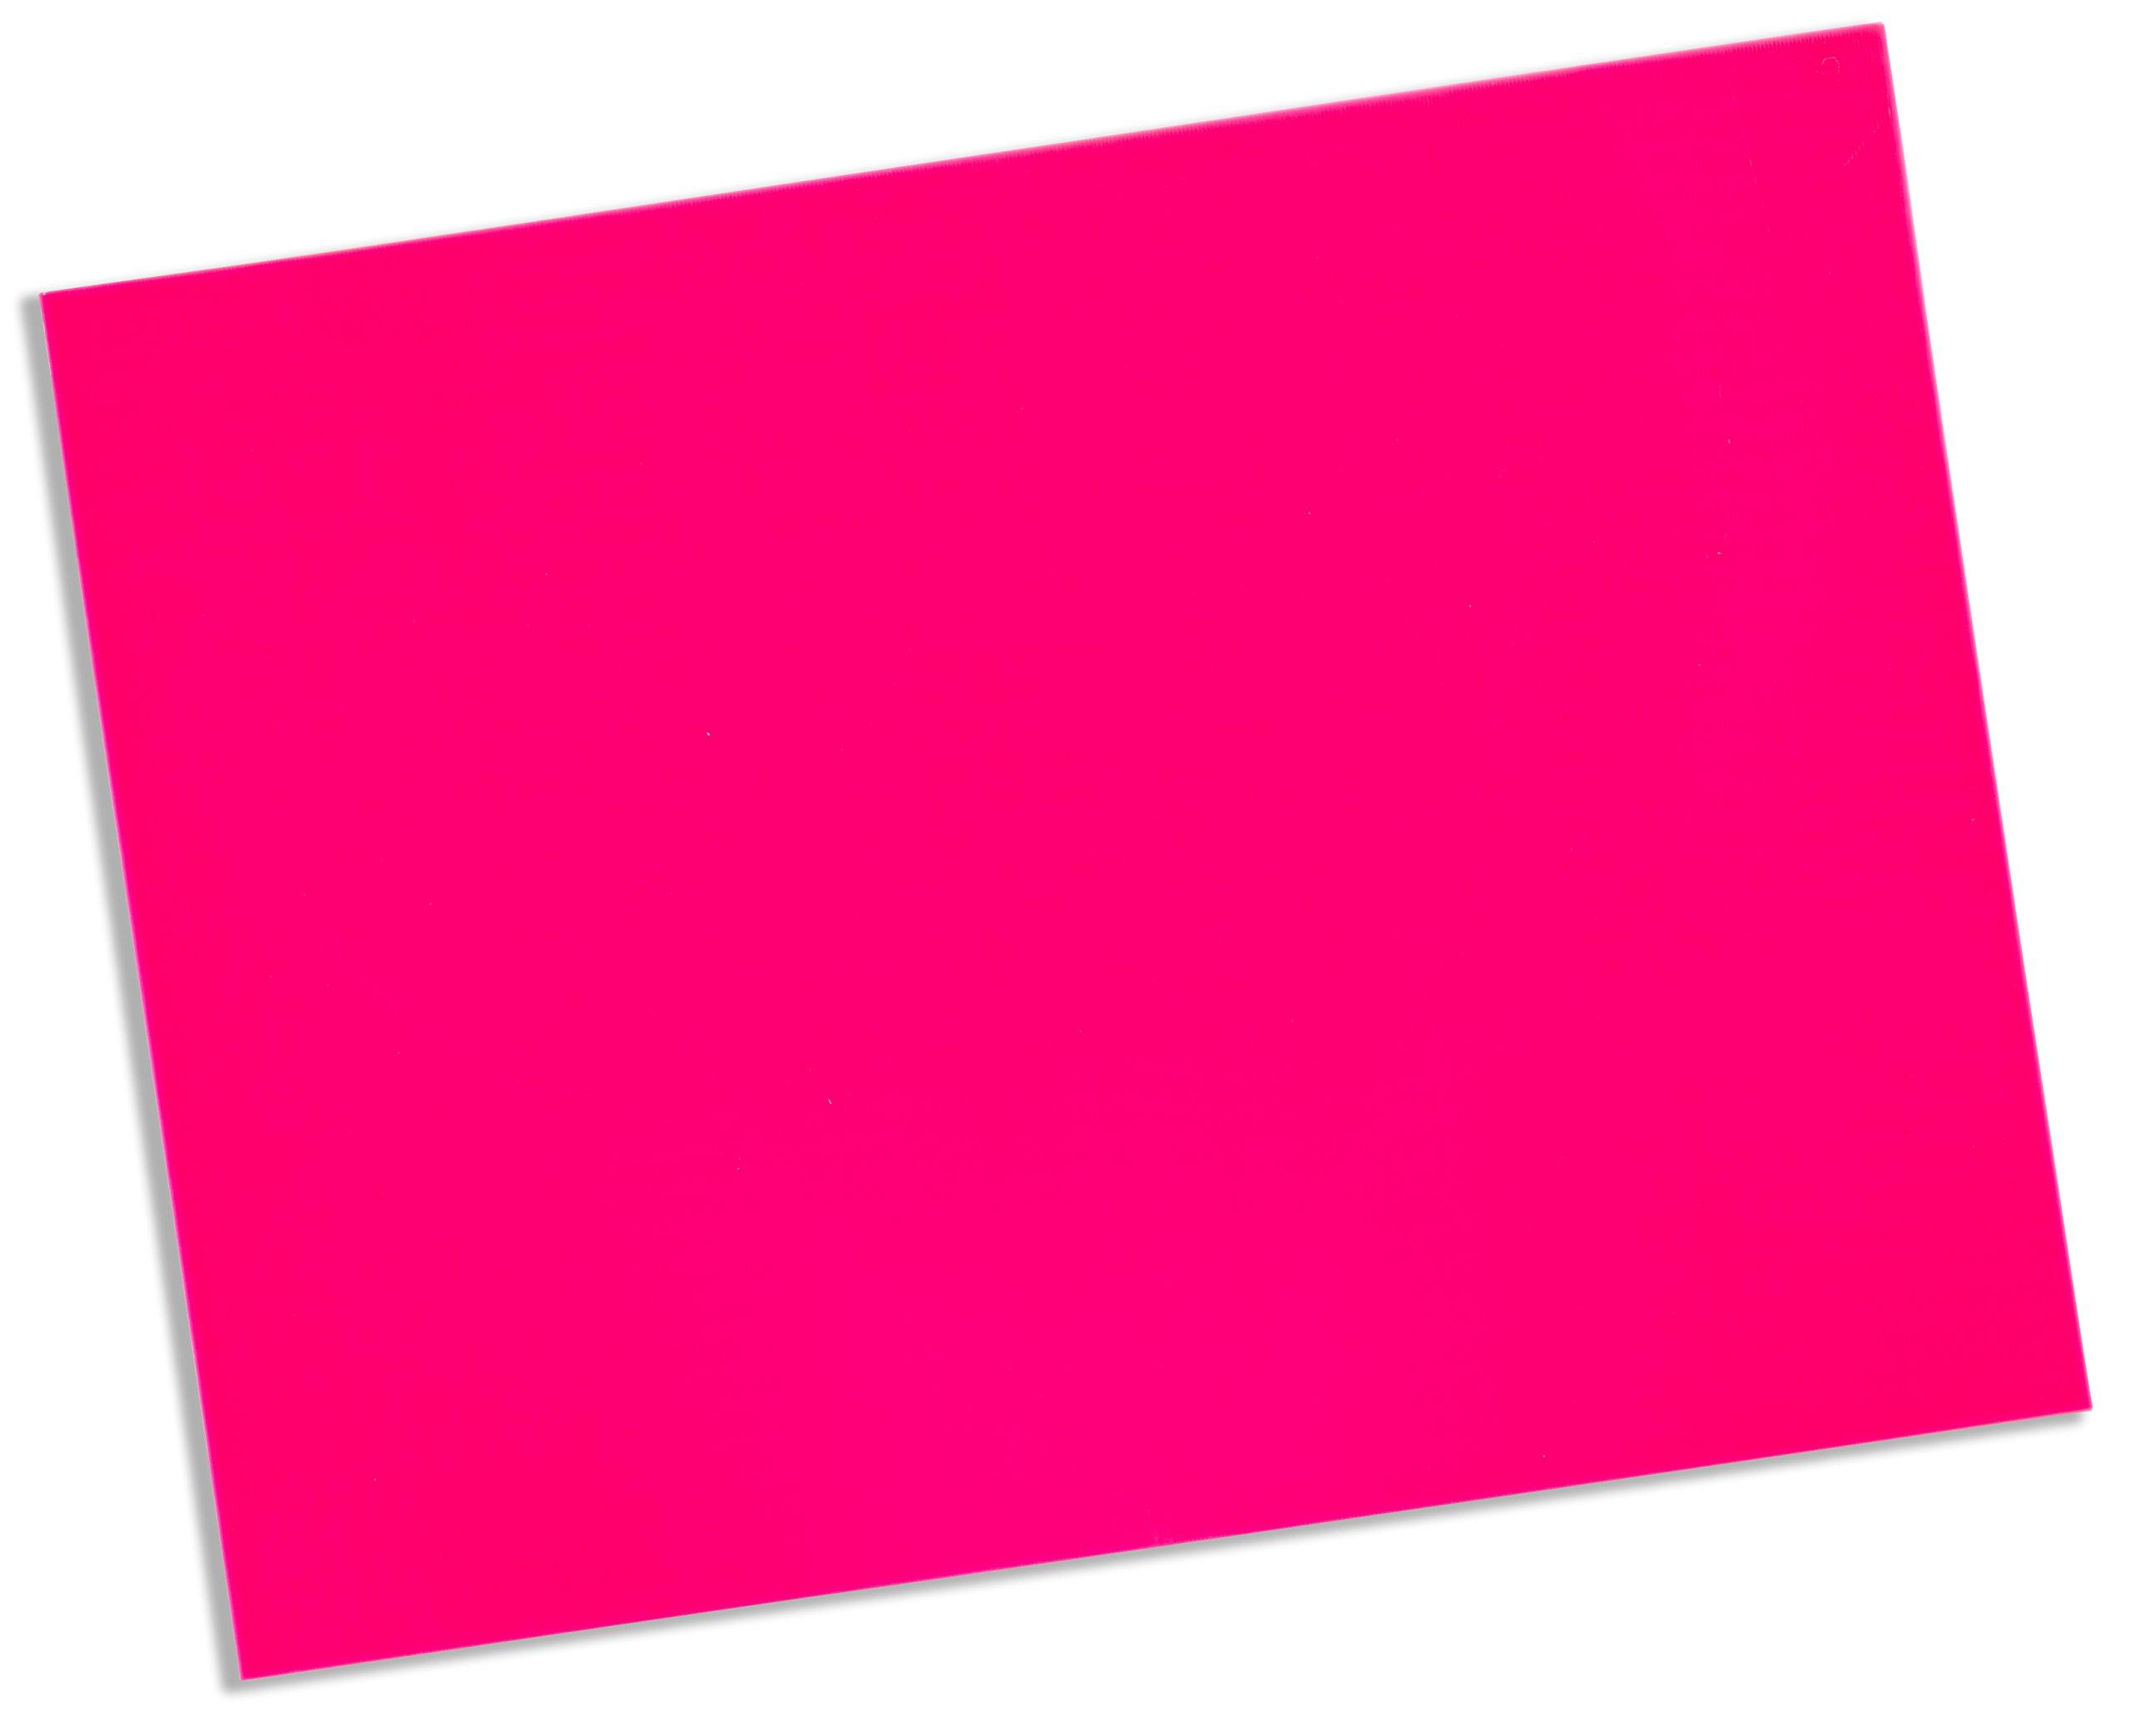 Cedarburg Rolyan Splinting Material Sheet, Aquaplast-T Watercolors, Hot Pink, 1/8'' x 18'' x 24'', Solid, Single Sheet